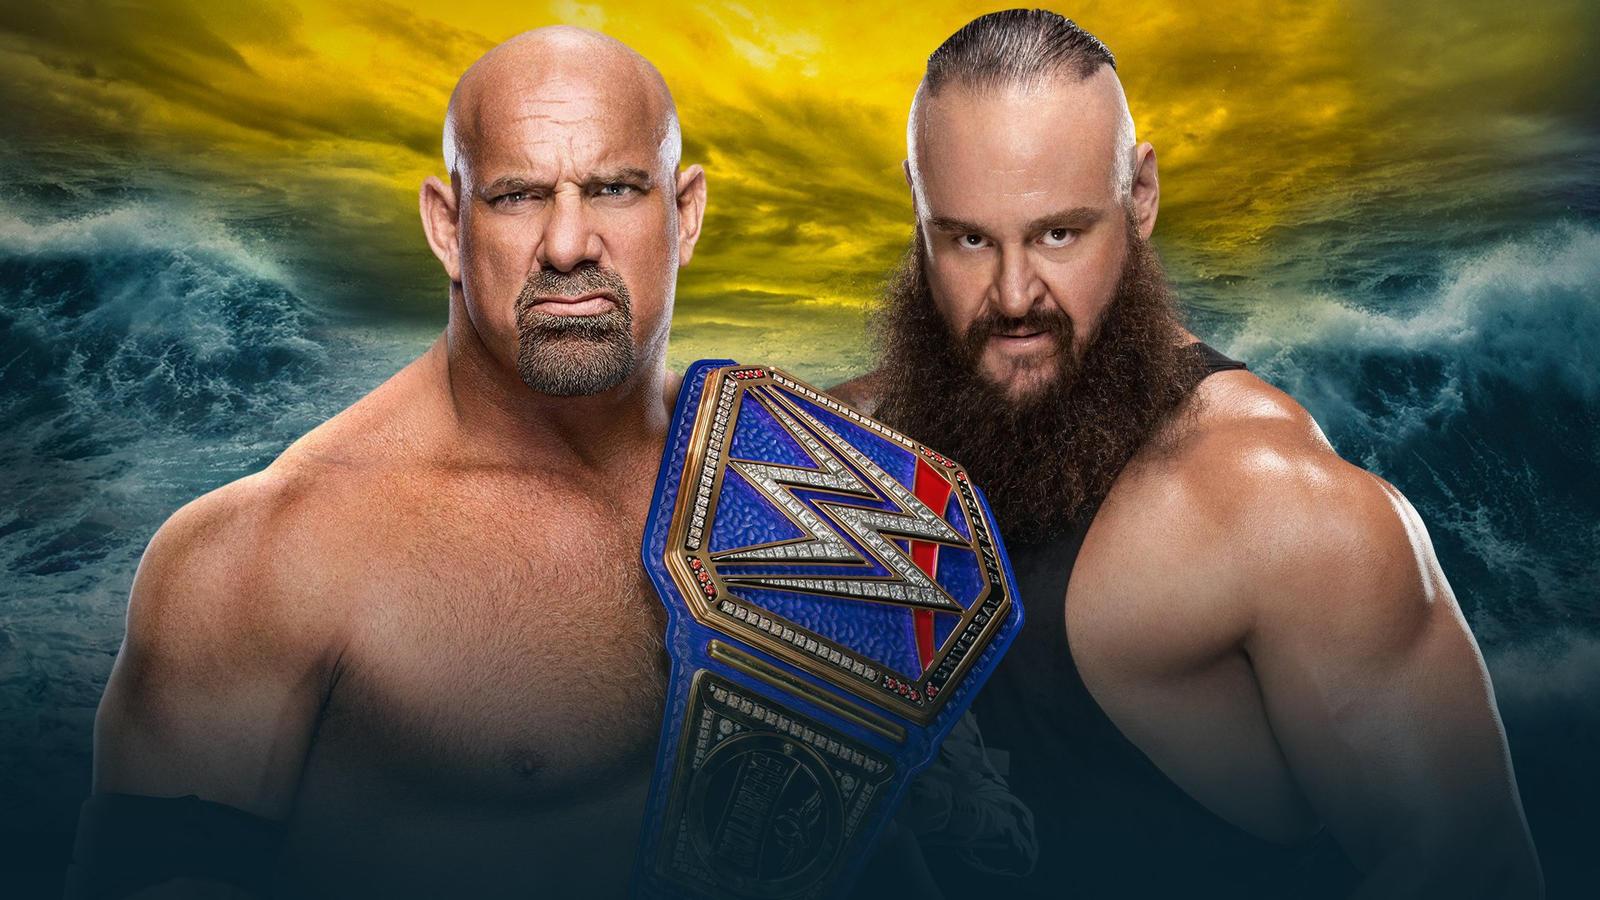 WWE Removes Roman Reigns From Wrestlemania 36; Goldberg's New Opponent Revealed 1